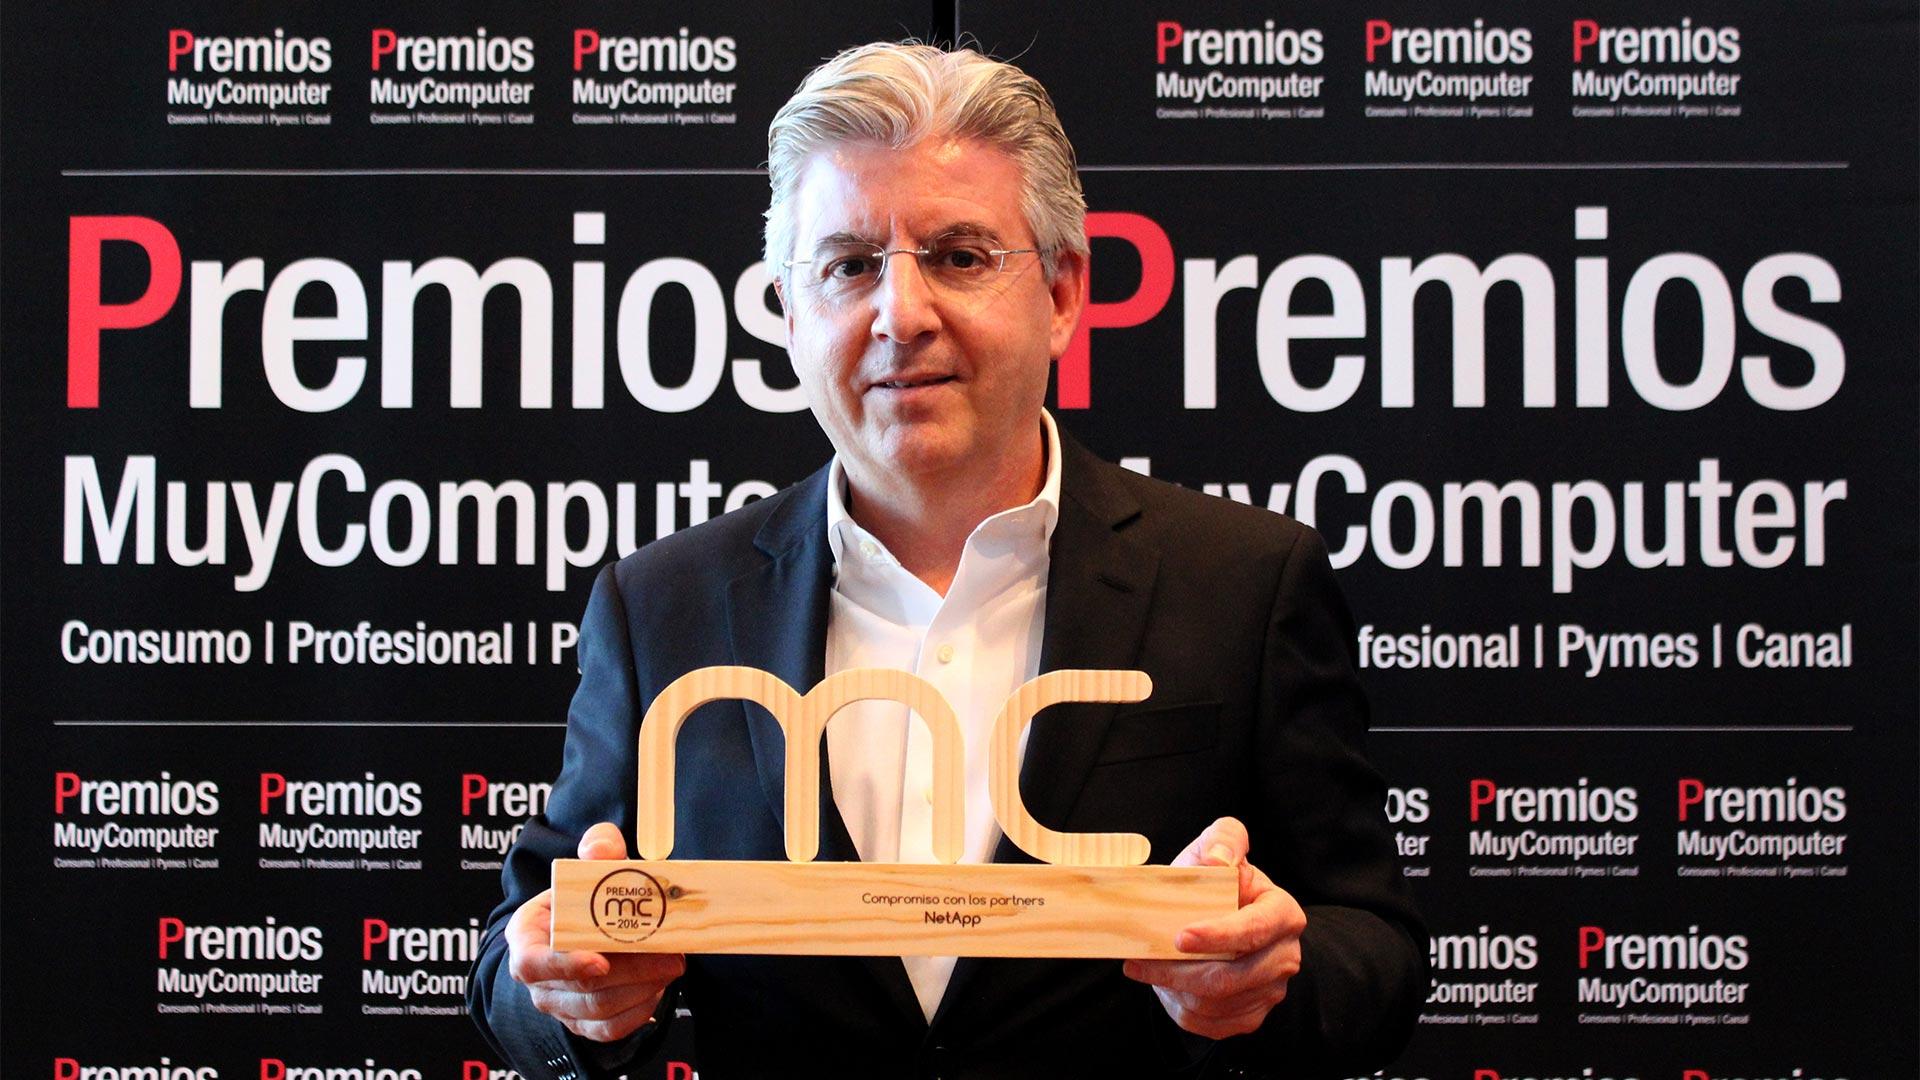 premiosmc2016-compromiso-partners-netapp